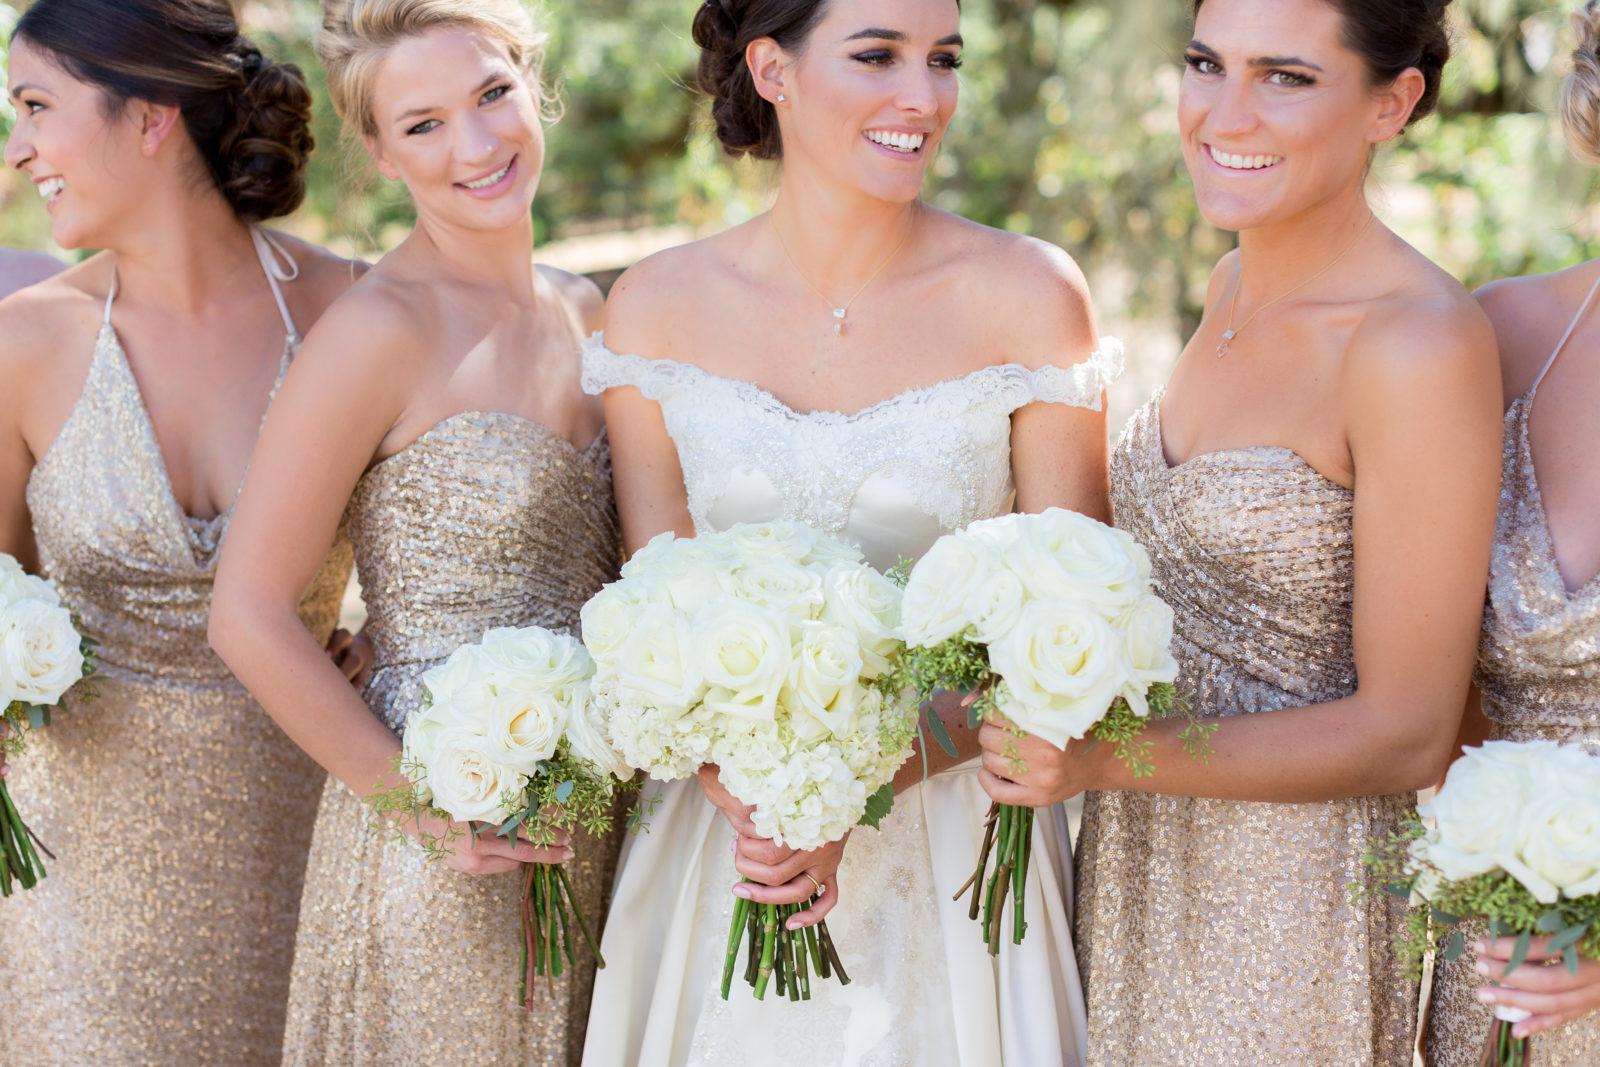 1San-Francisco-Wedding-Photographer-1-of-1600x1067.jpg